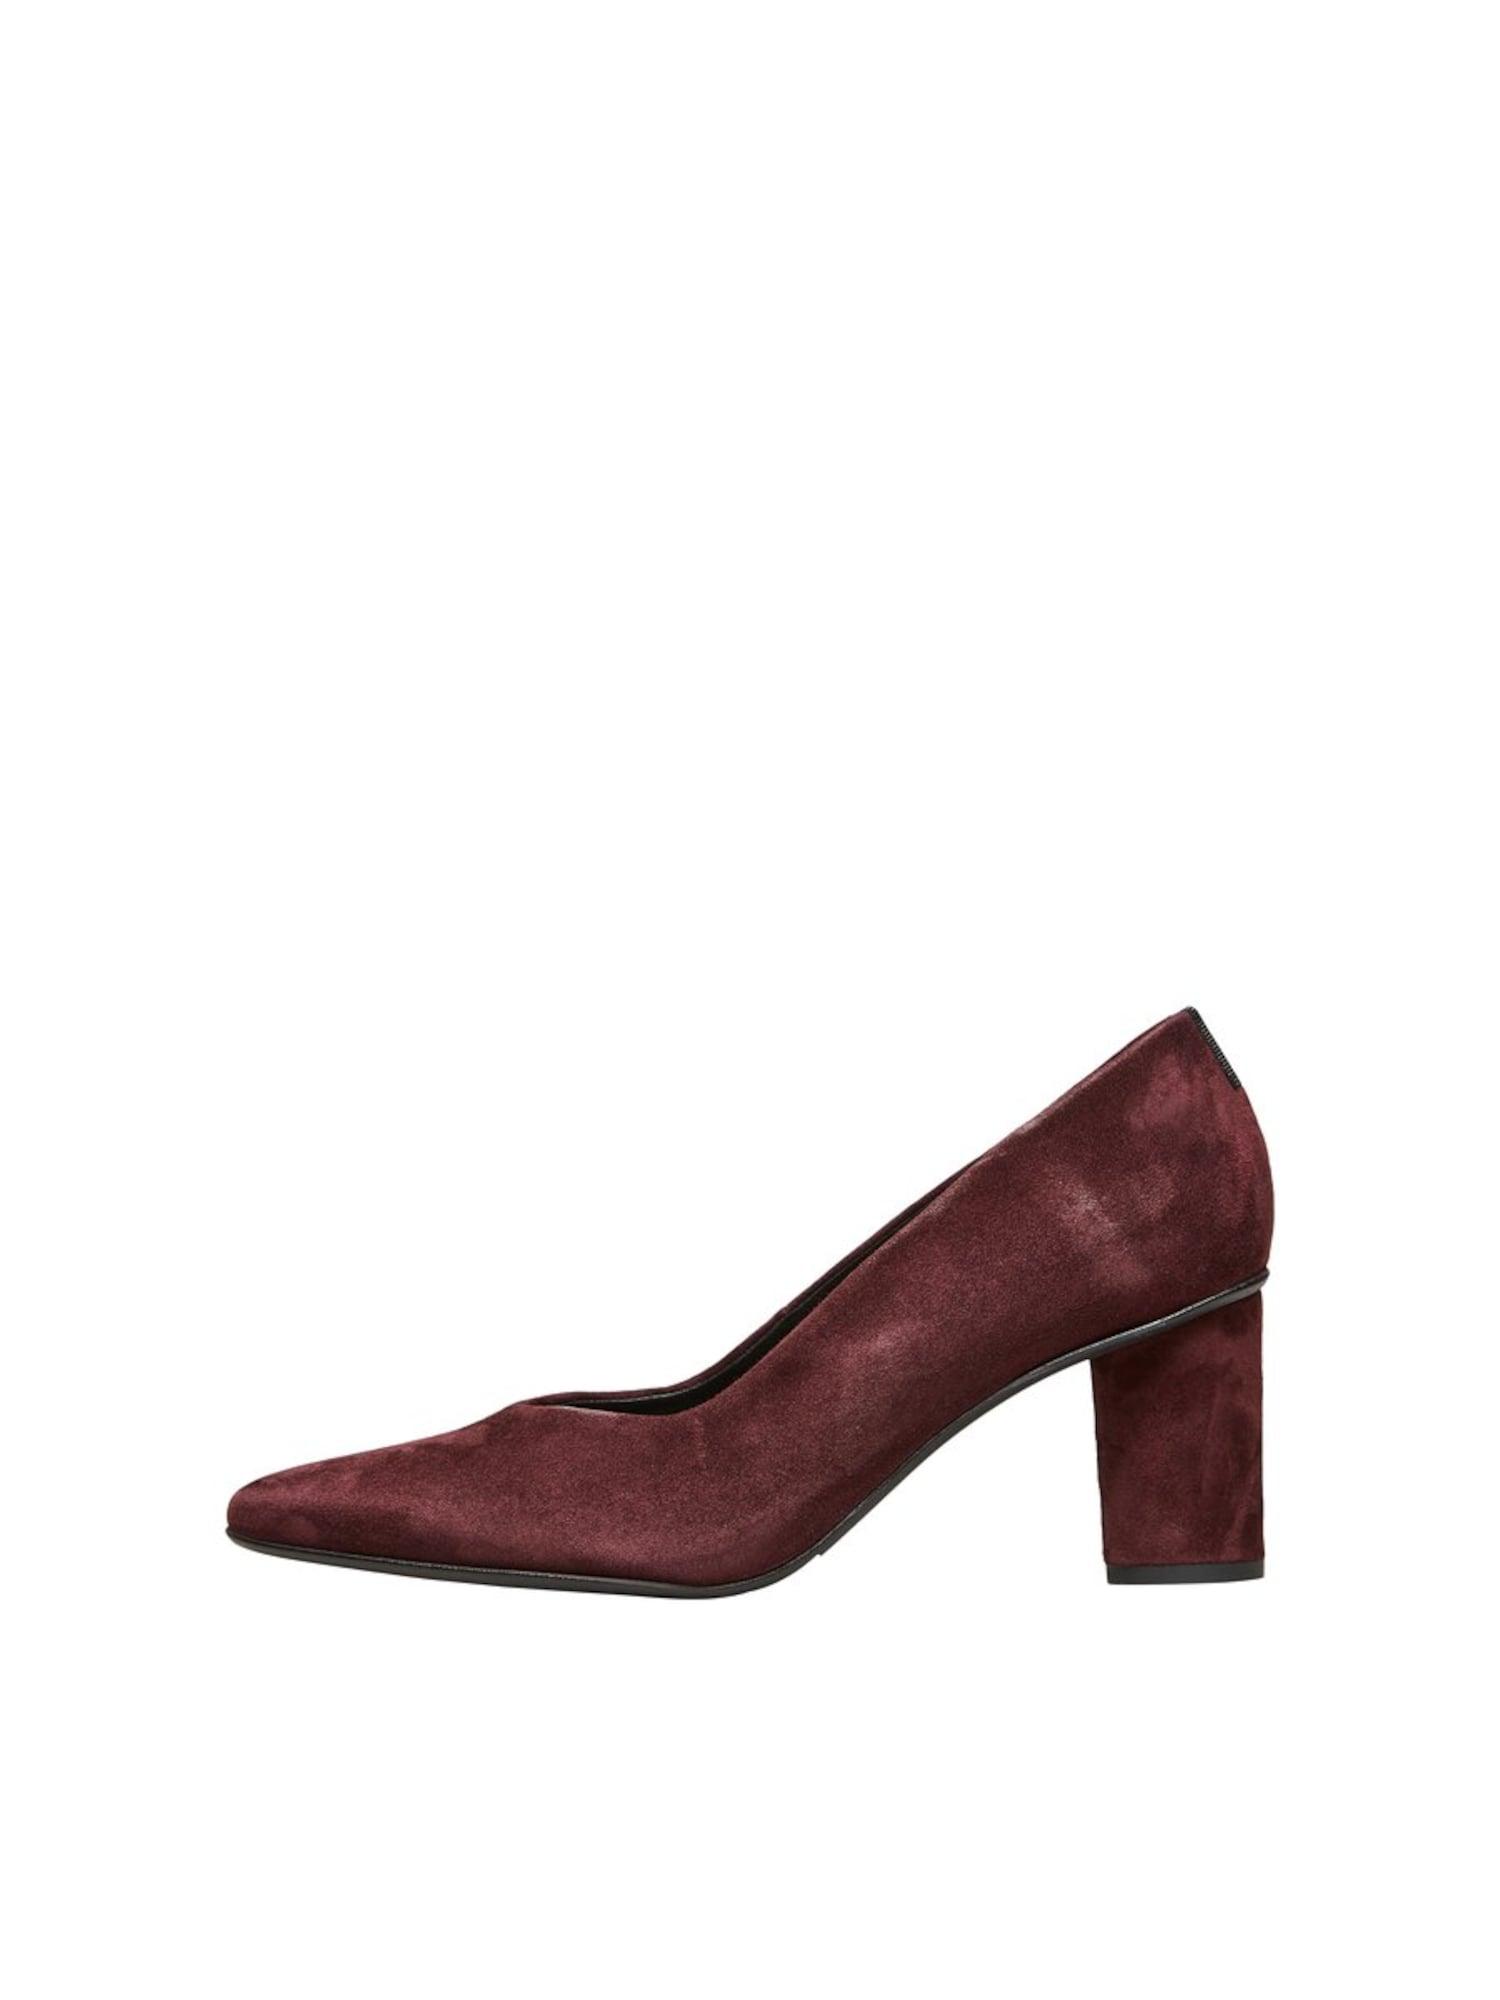 Damen Selected Femme Pumps grau, violet | 05714495725168